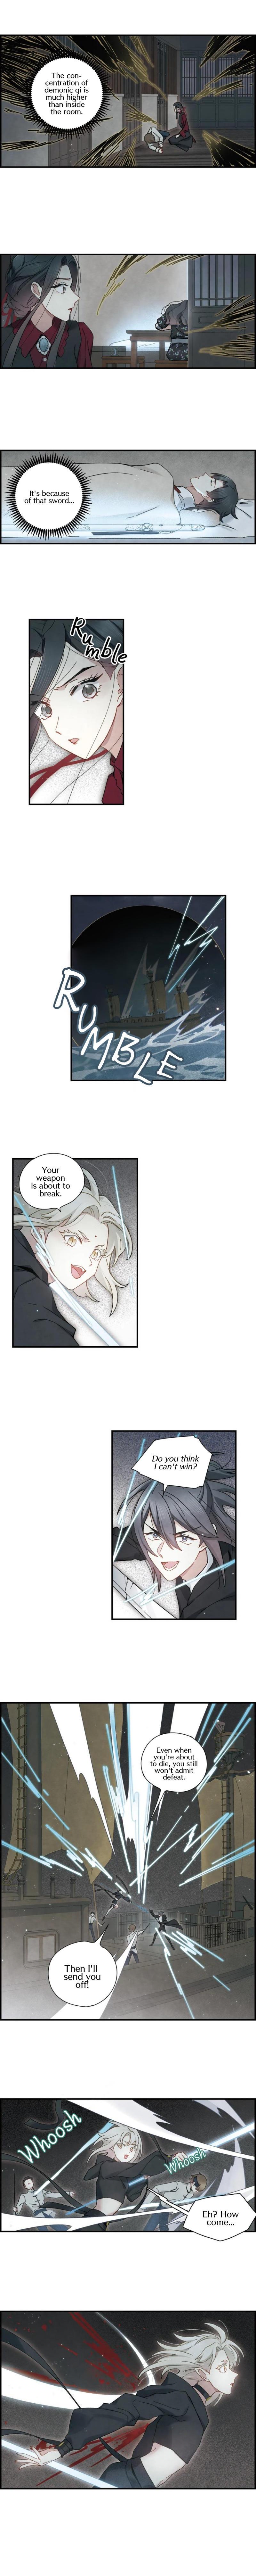 Mejaz - Regulus In The World Chapter 34.2: Demonic Influence page 4 - Mangakakalots.com